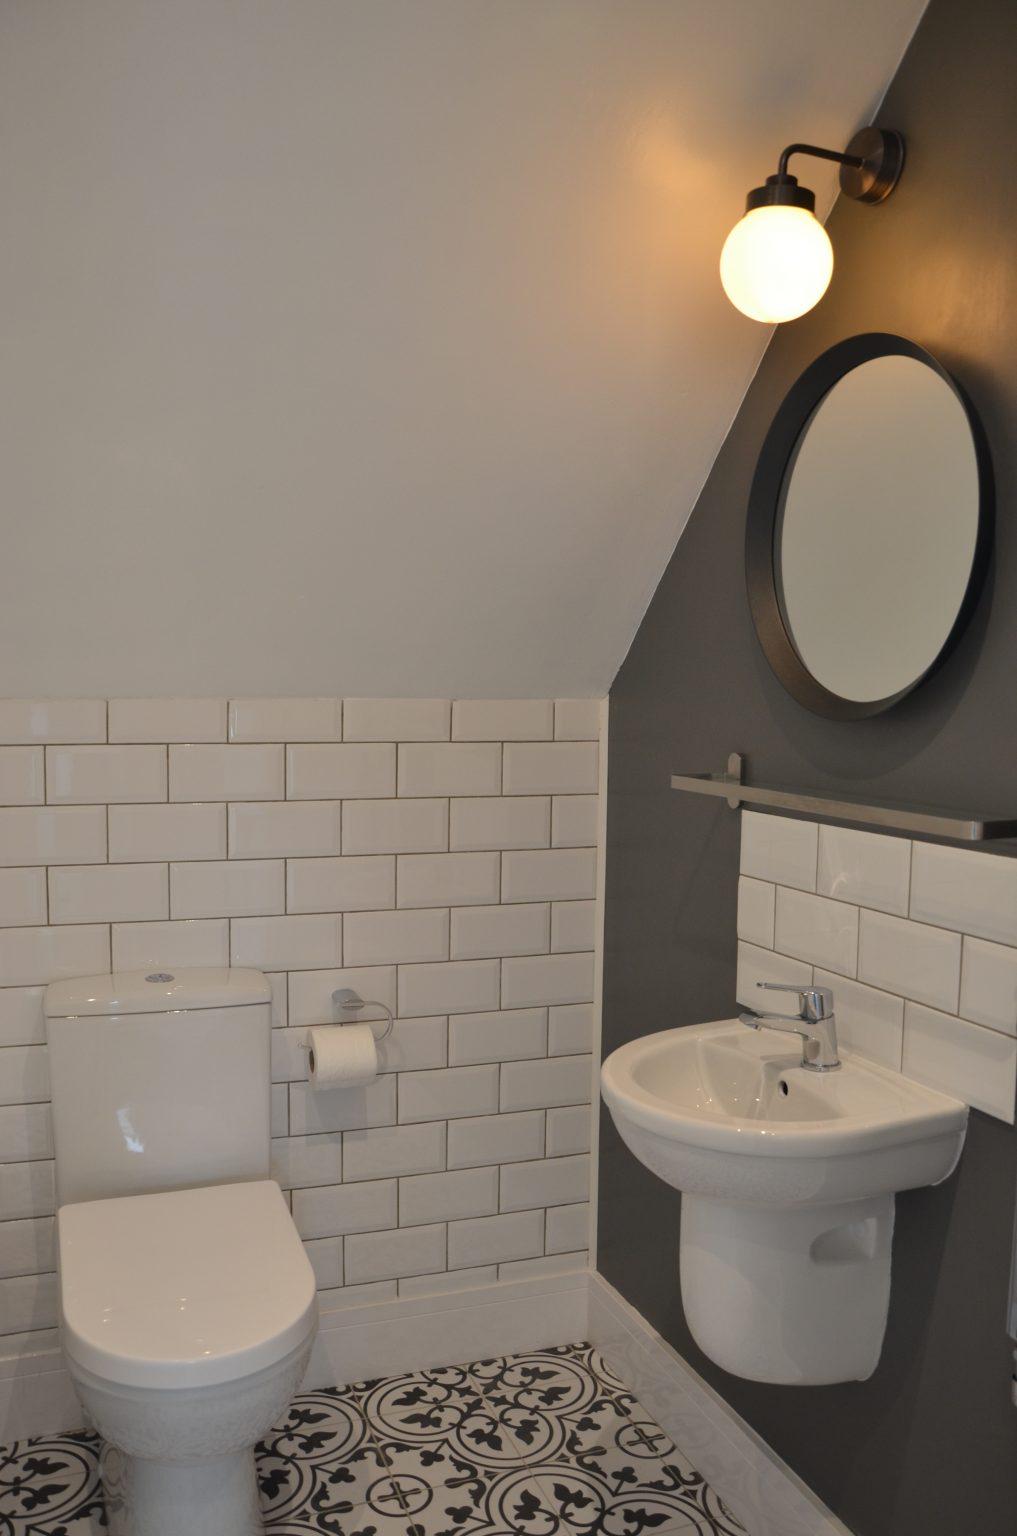 Croft4 bathroom Isle of Skye holiday accommodation self catering